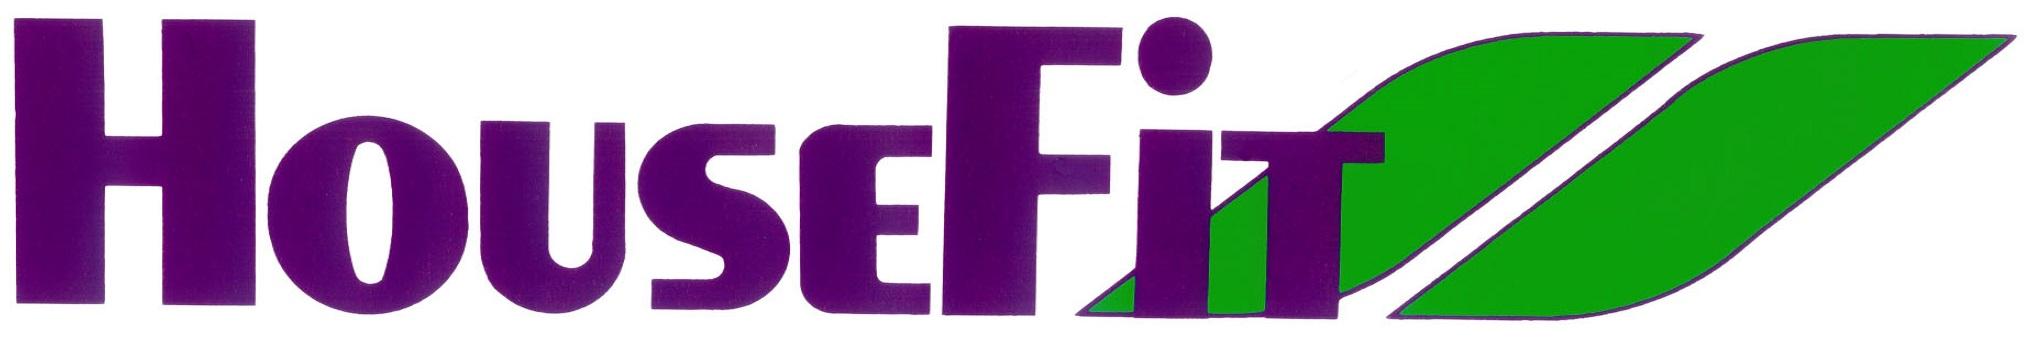 logo Housefit